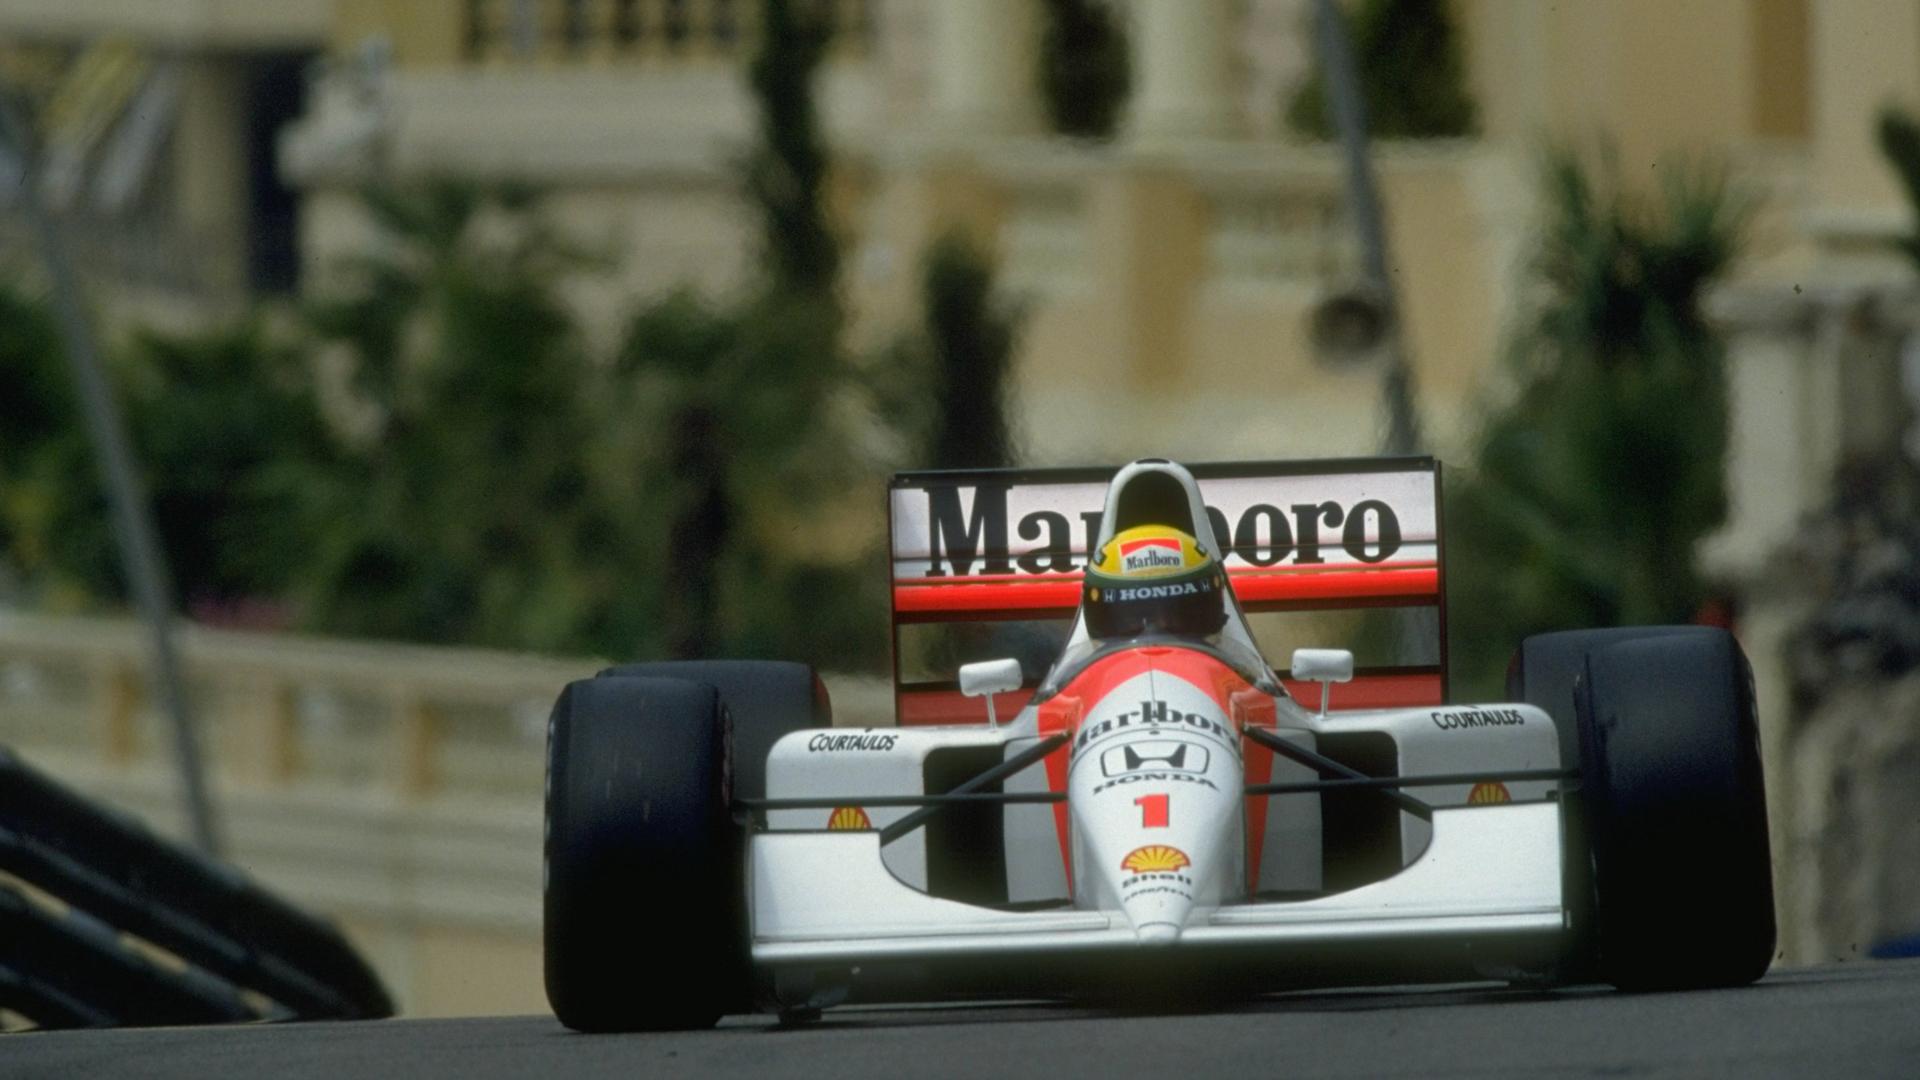 75 Ayrton Senna Wallpaper On Wallpapersafari